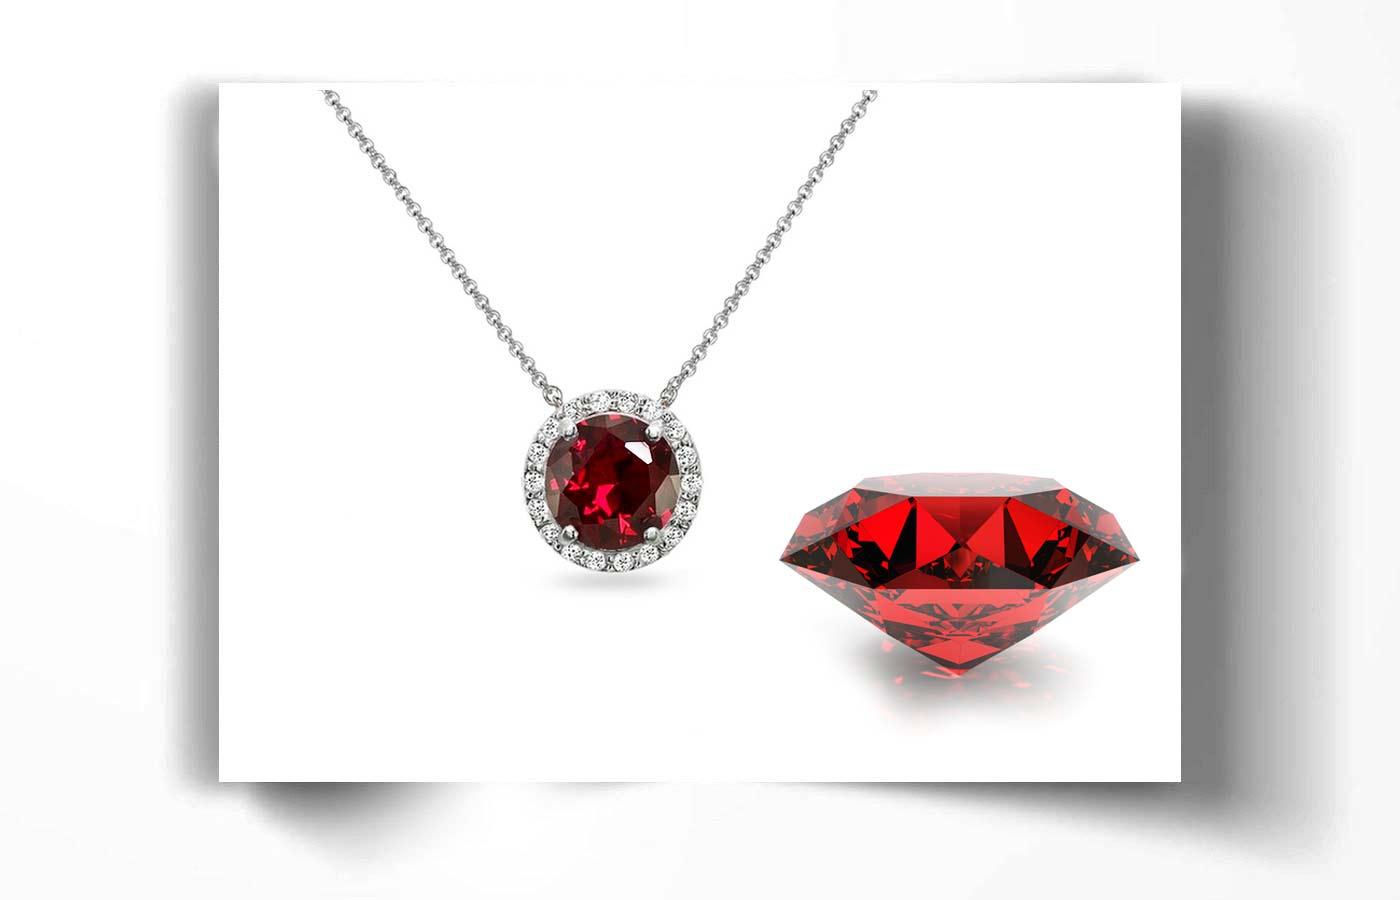 Ruby in Feng Shui 7a - رمز و رازهای یاقوت سرخ در فنگ شویی